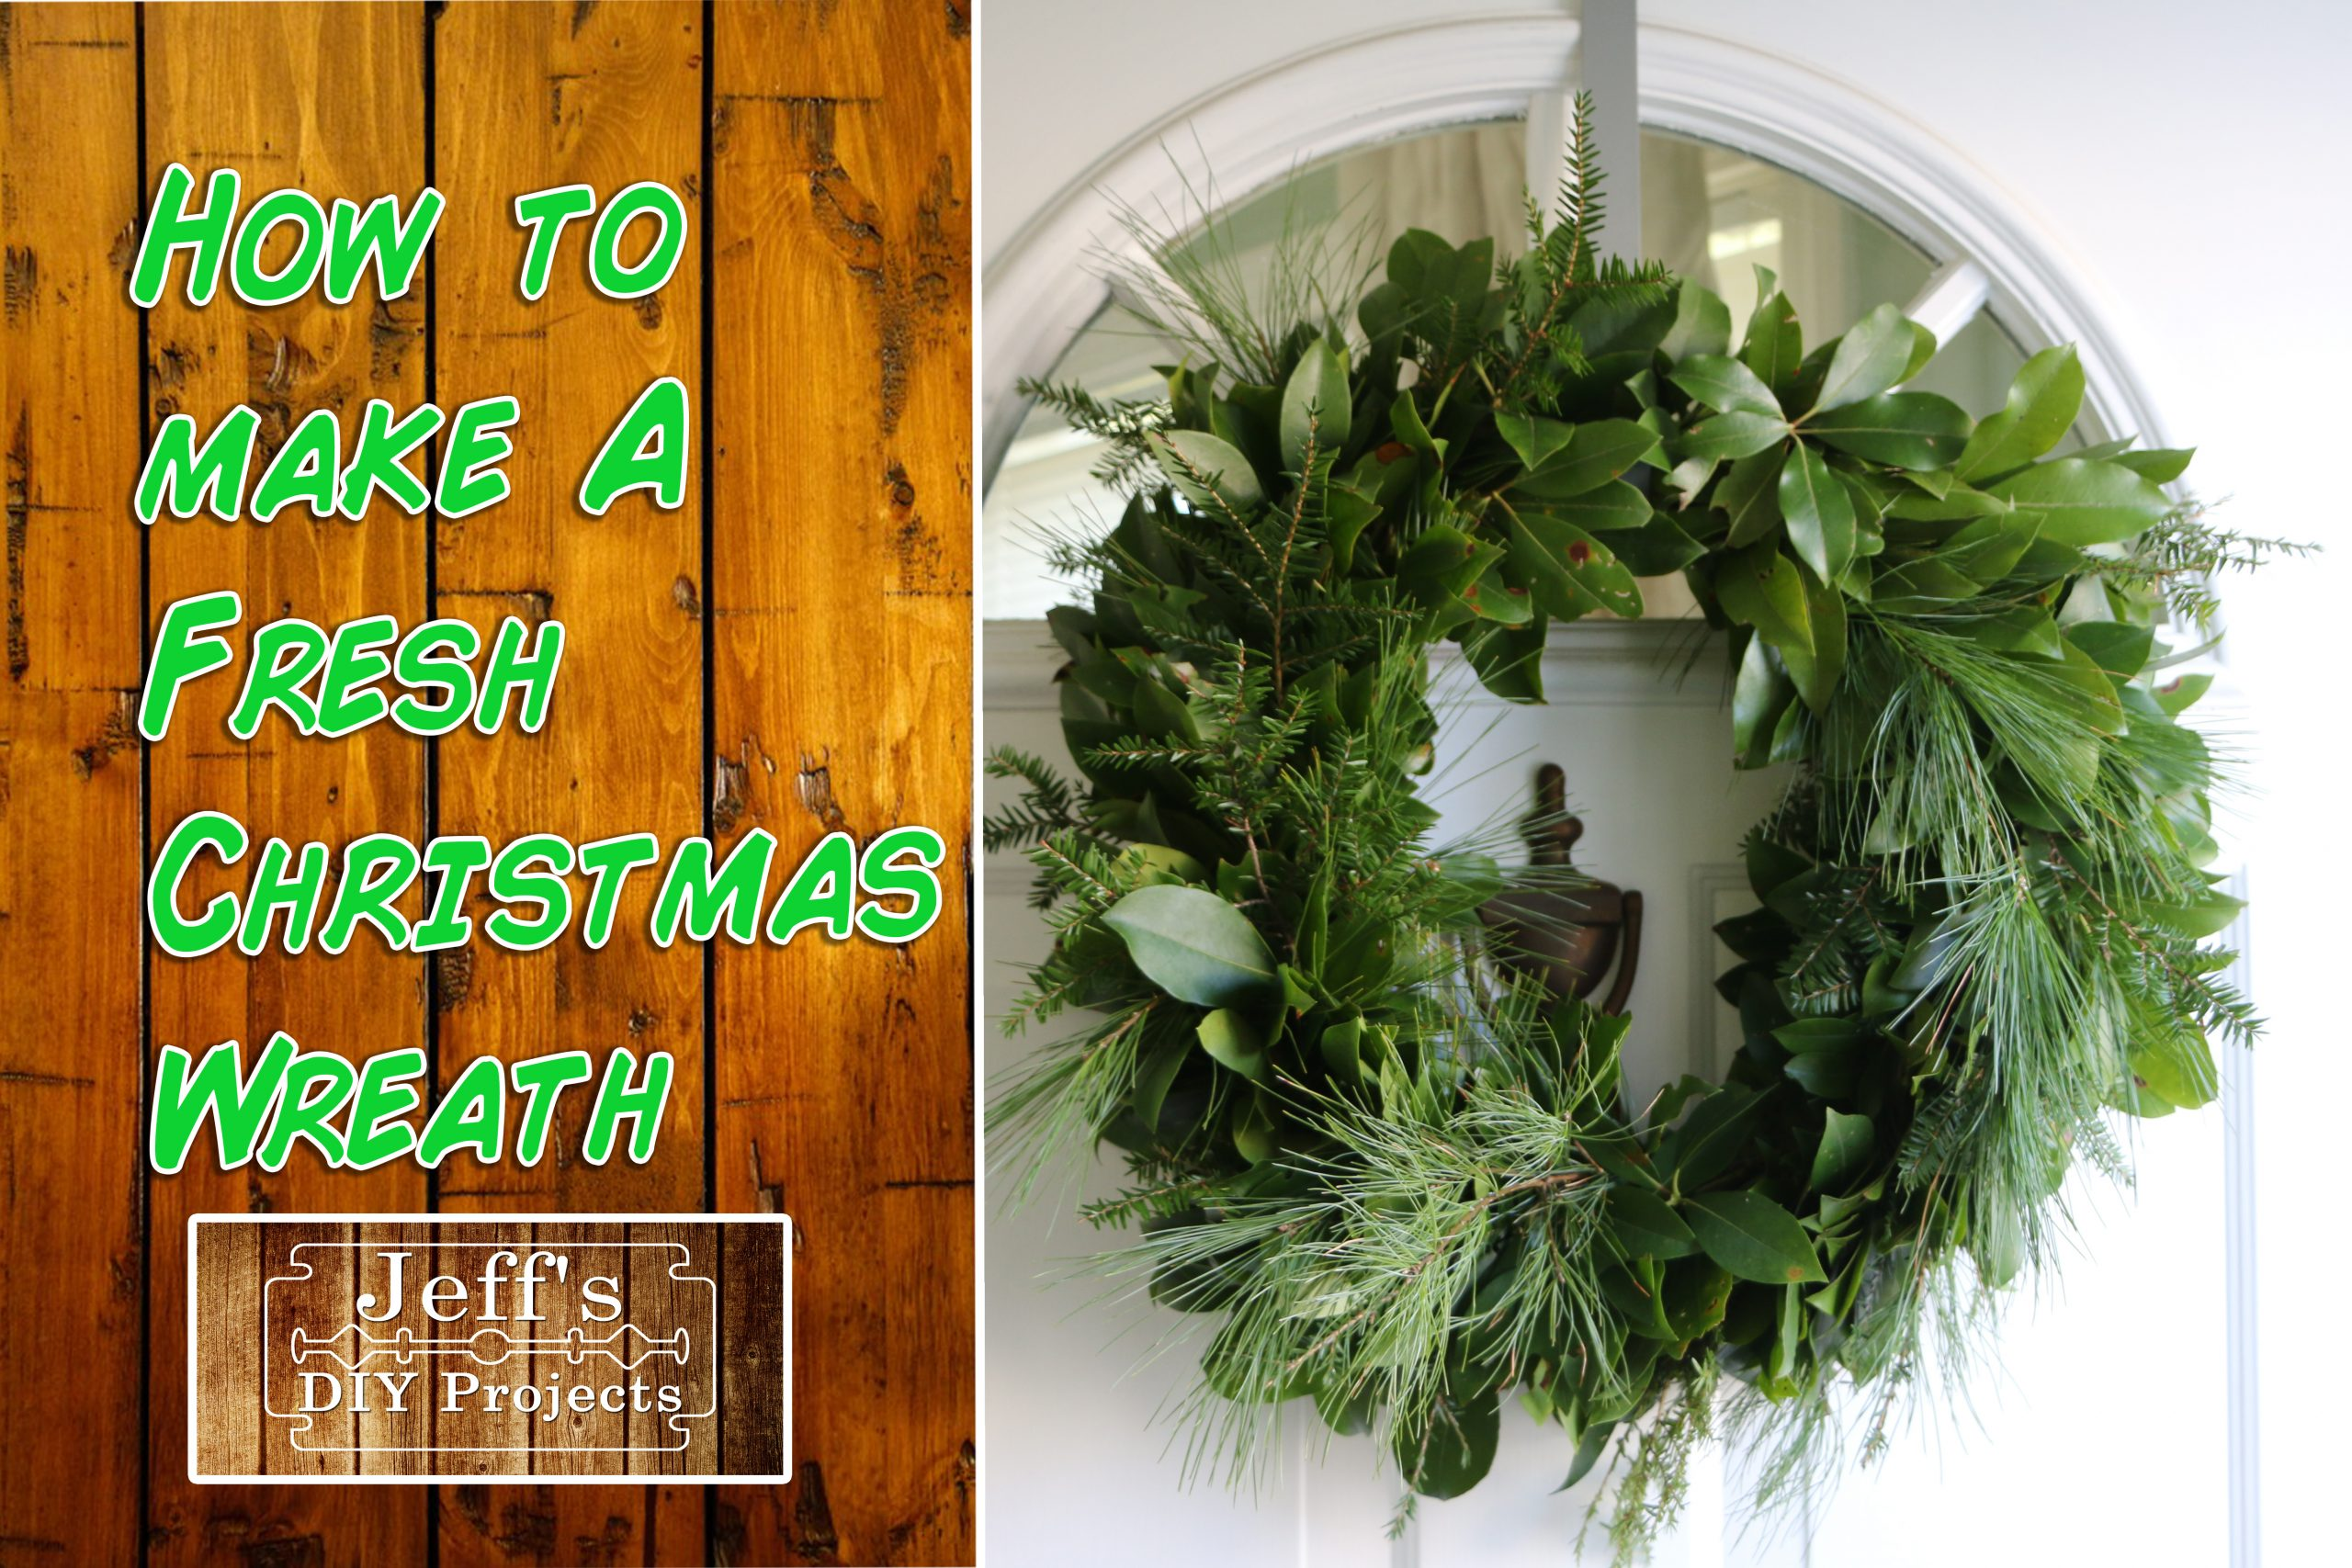 How to make a fresh Christmas wreath